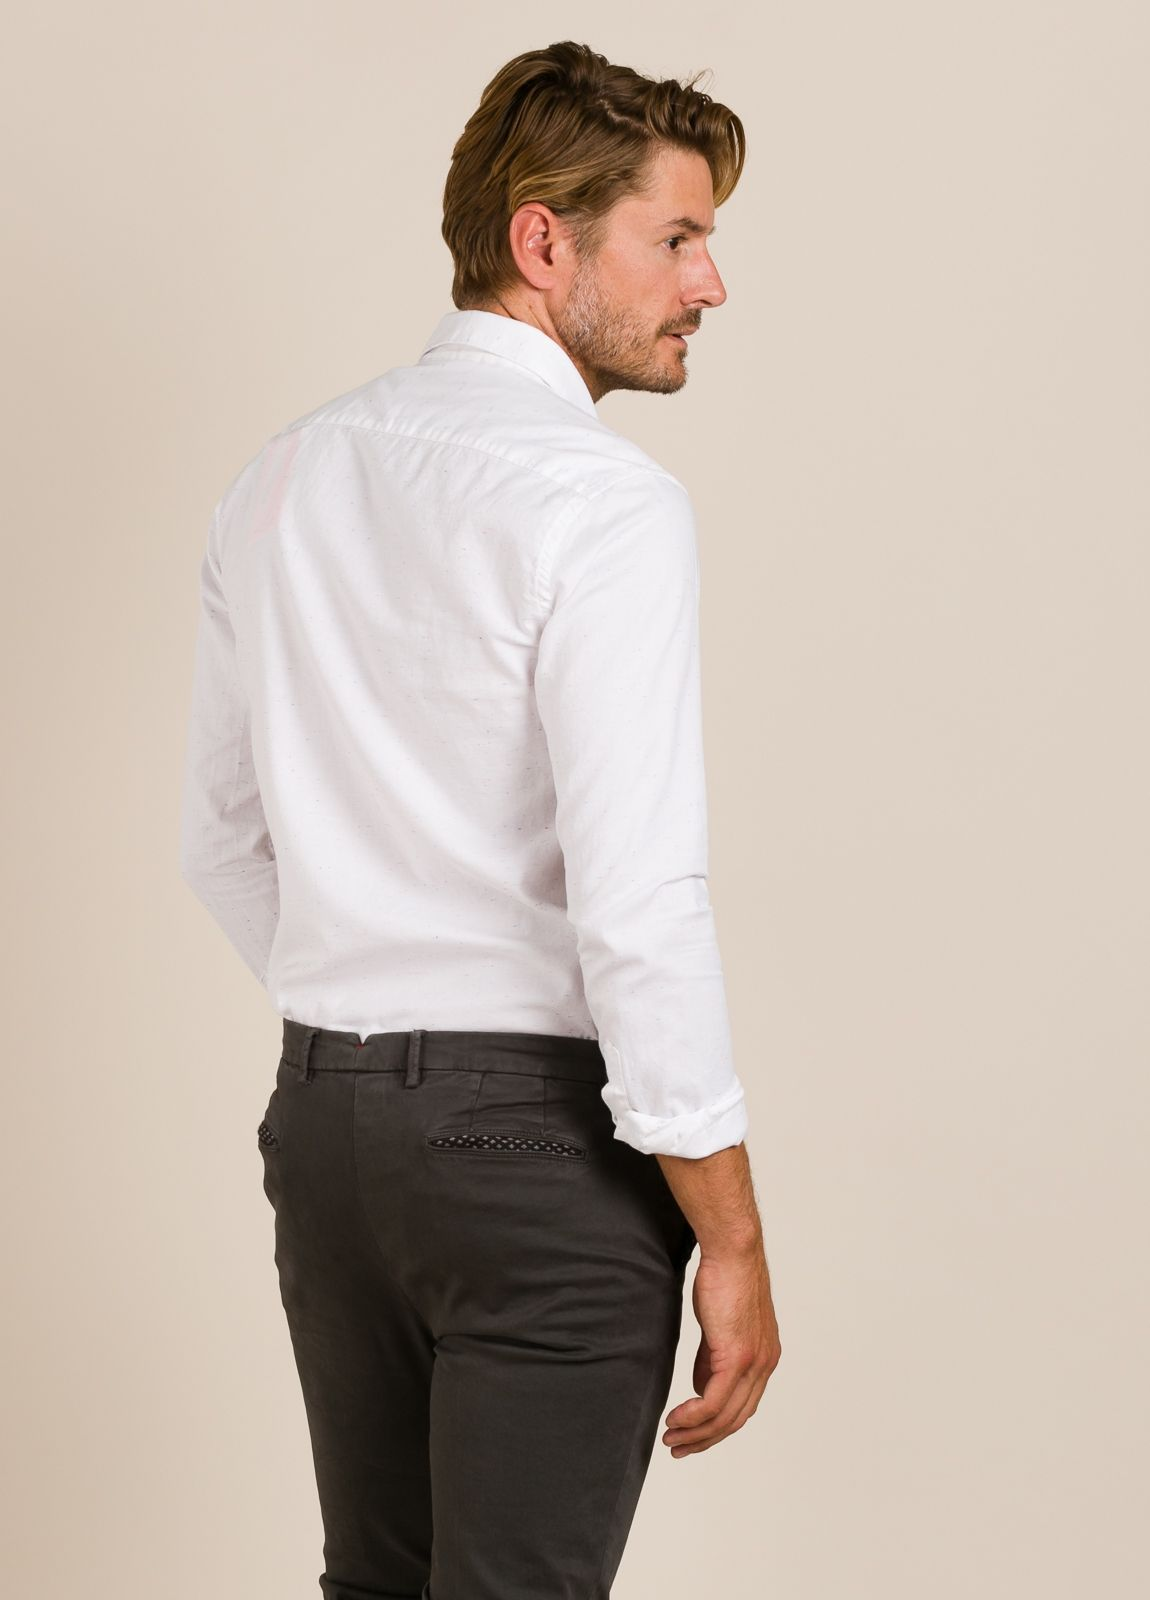 Camisa SCOTCH & SODA blanca. - Ítem1